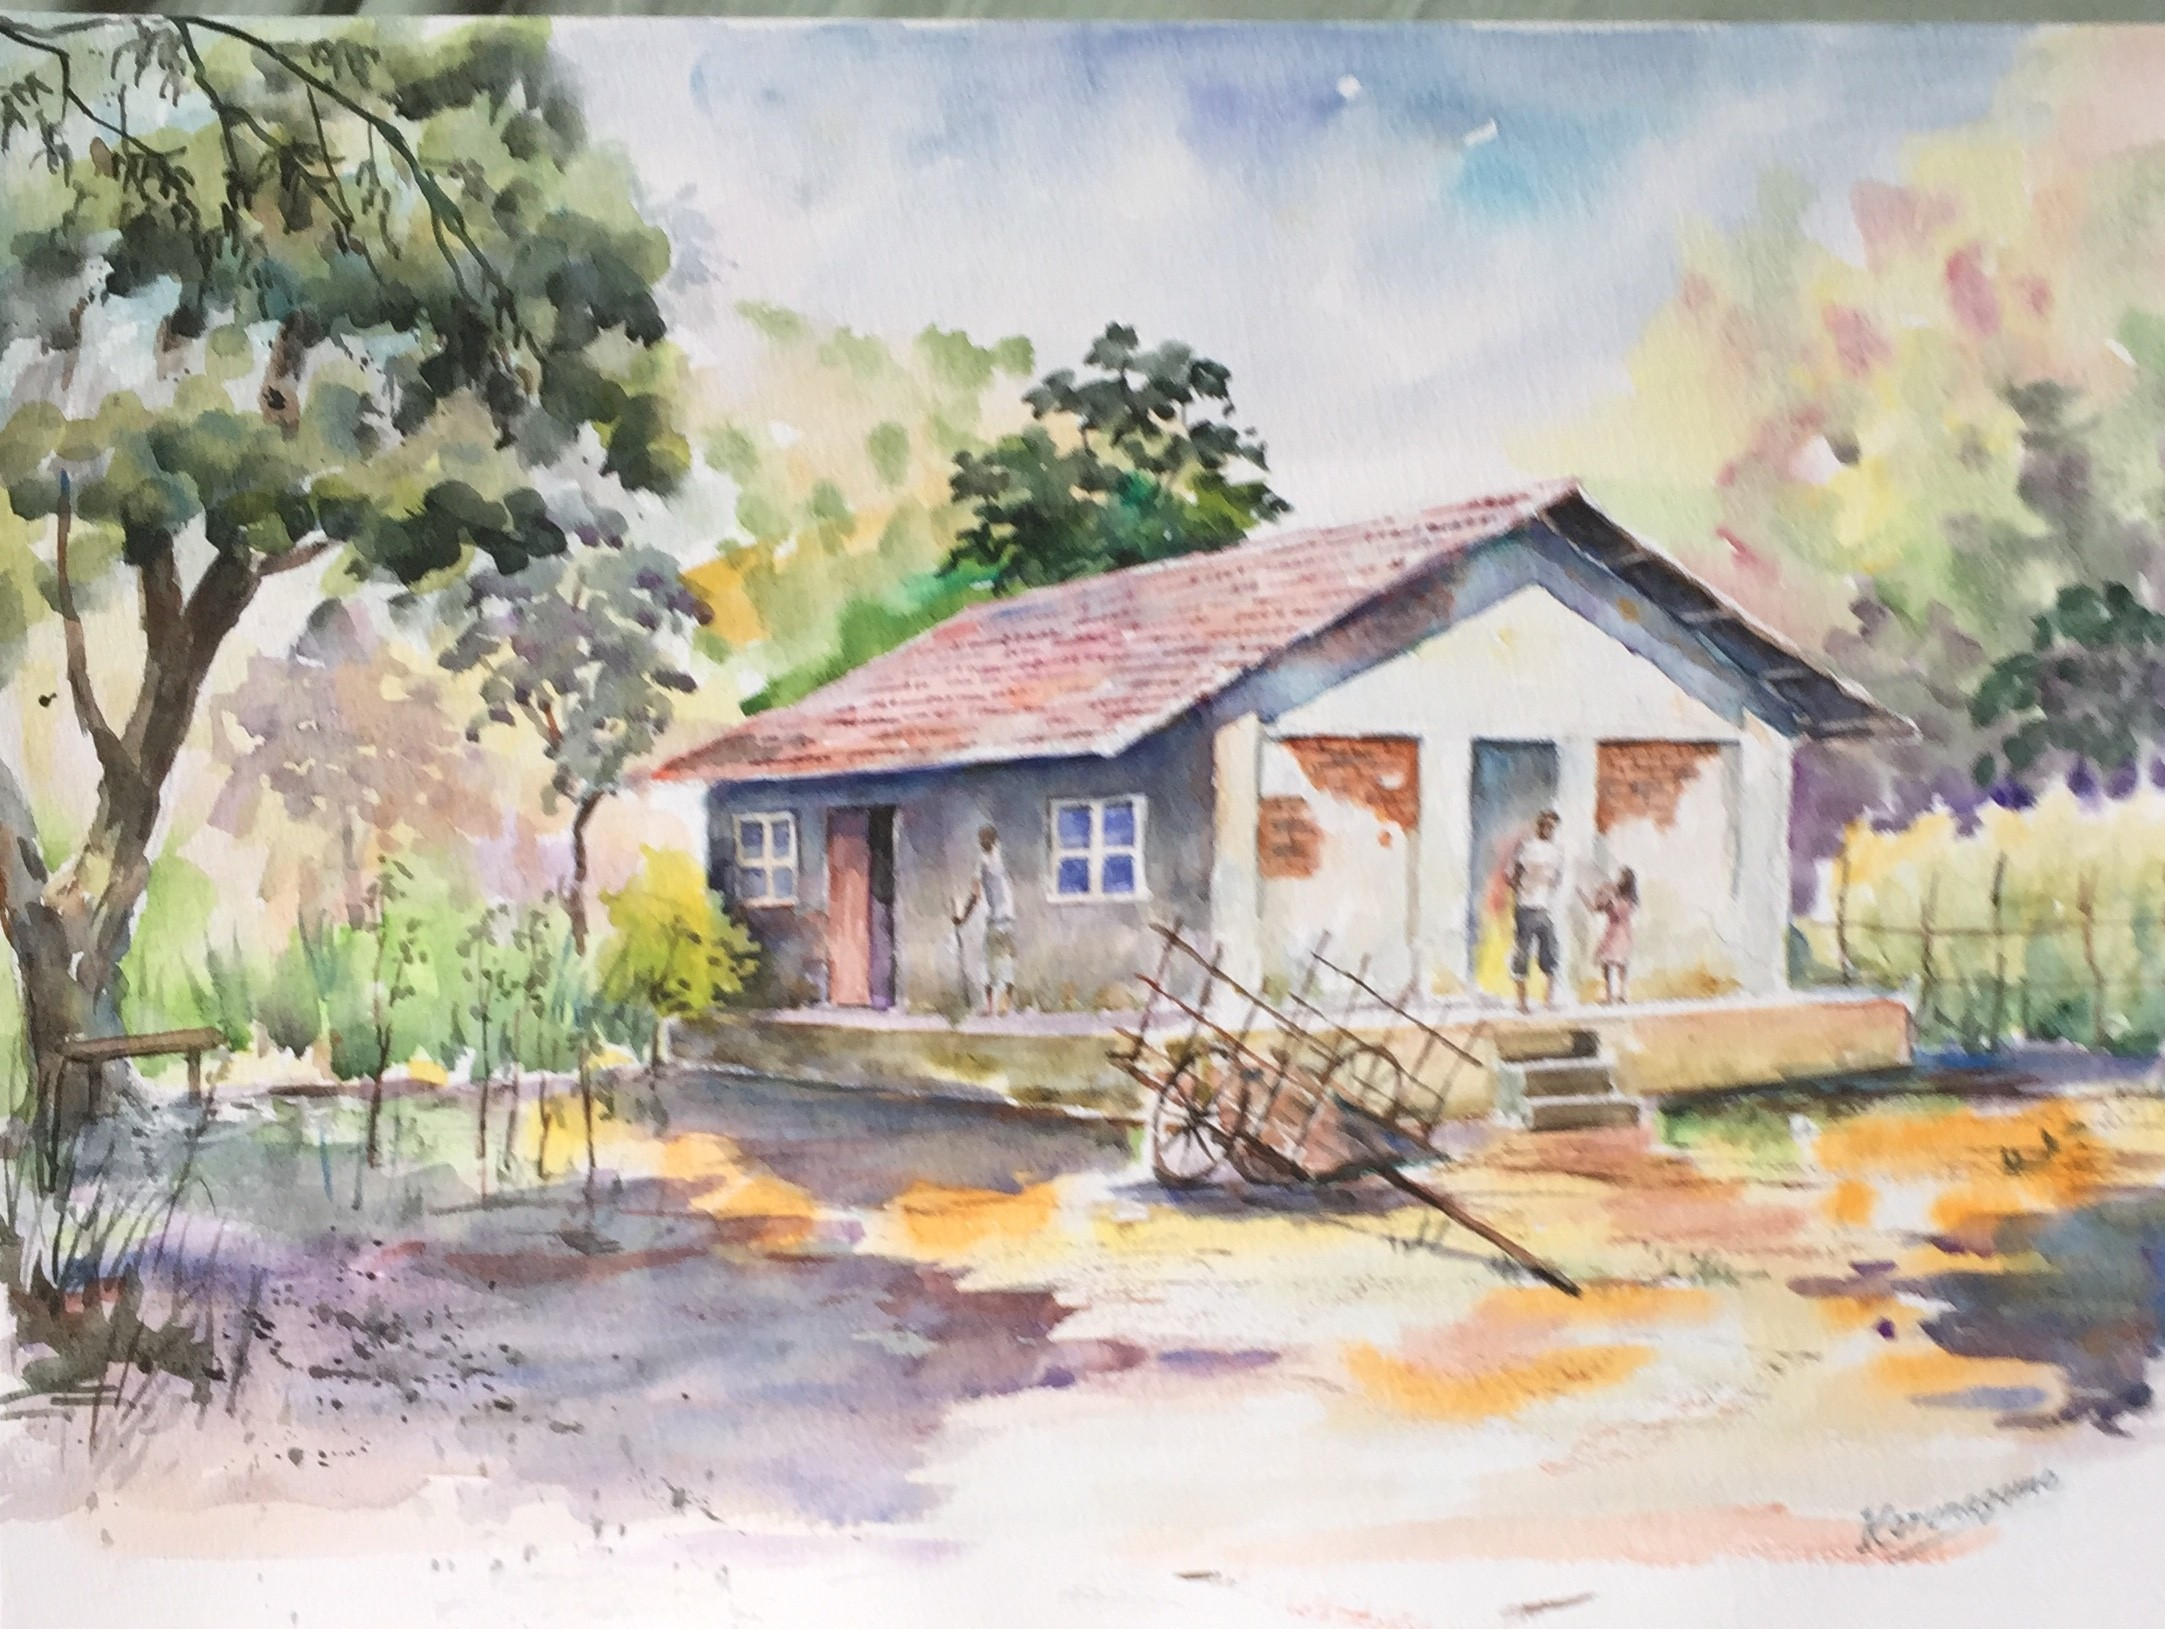 Cart before house by Sarath Karunagama